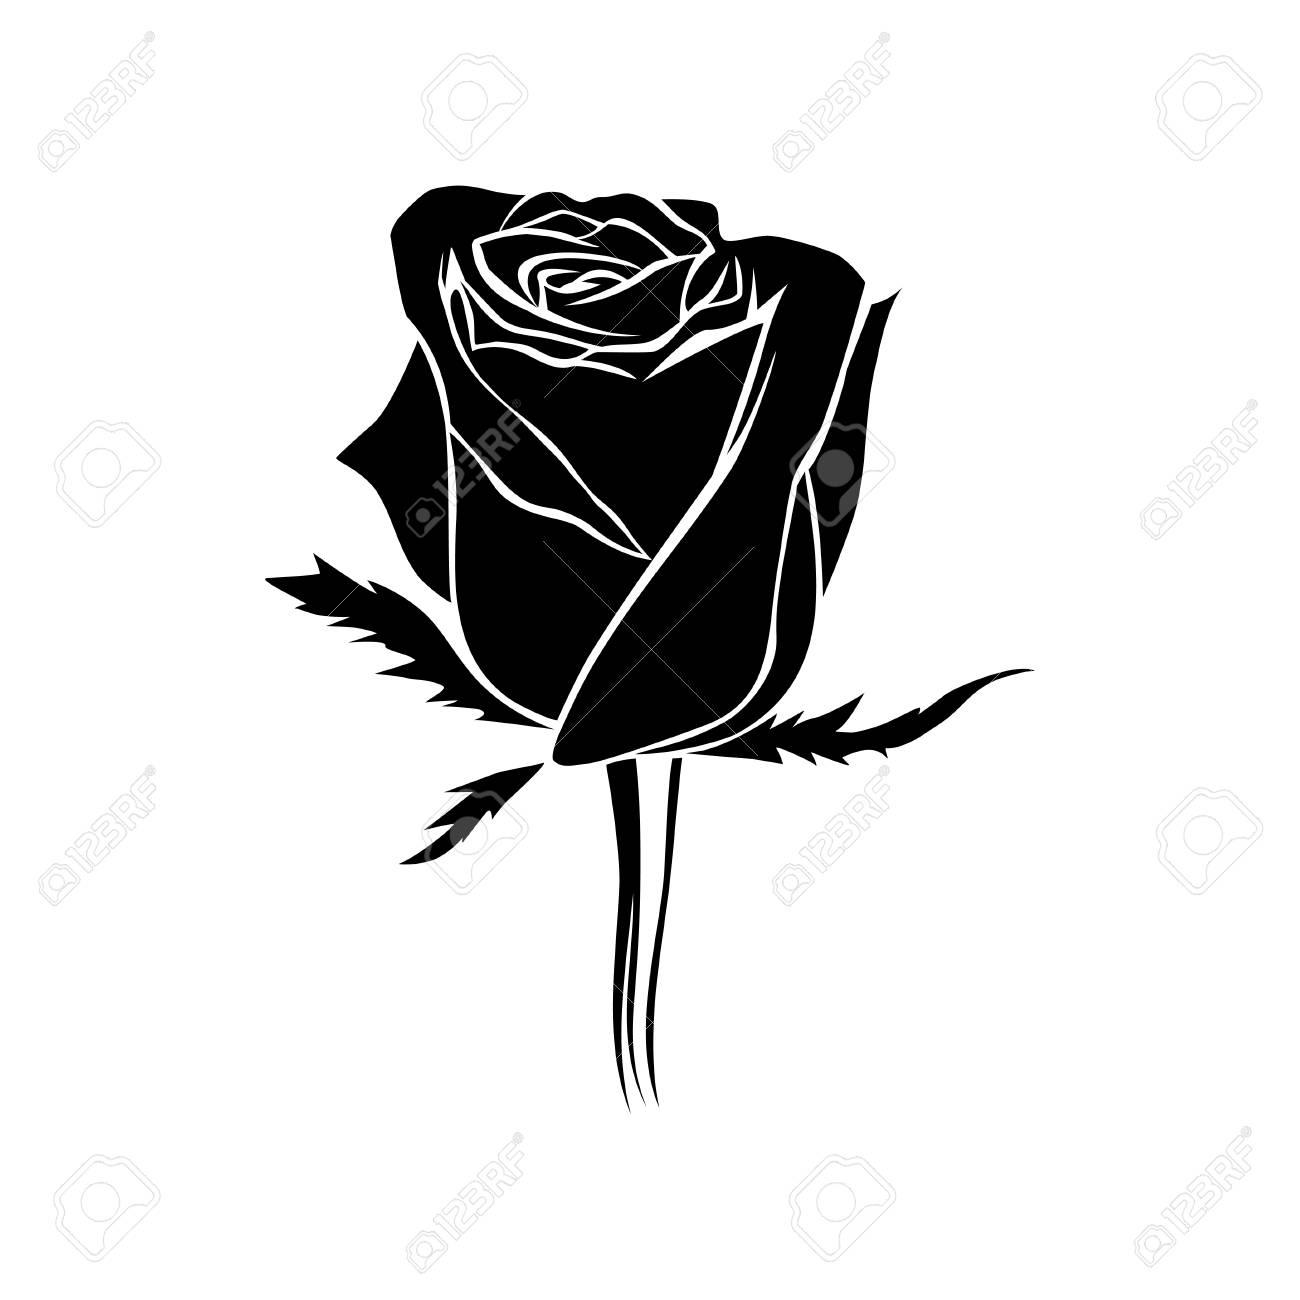 Vector Black Rosebud Silhouette Logo Tattoo Or Emblem Of Rose